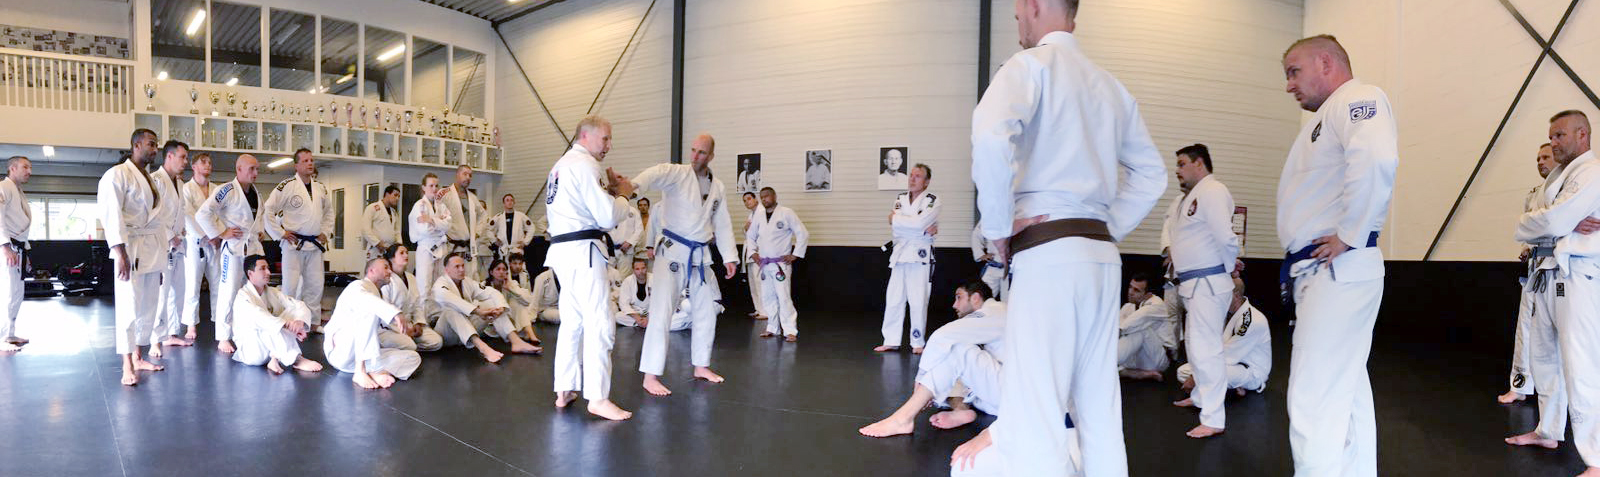 harold-harder_seminar_gracie-jiu-jitsu-gouda_bjj-braziliaans-jiu-jitsu-zelfverdediging_selfdefense-3